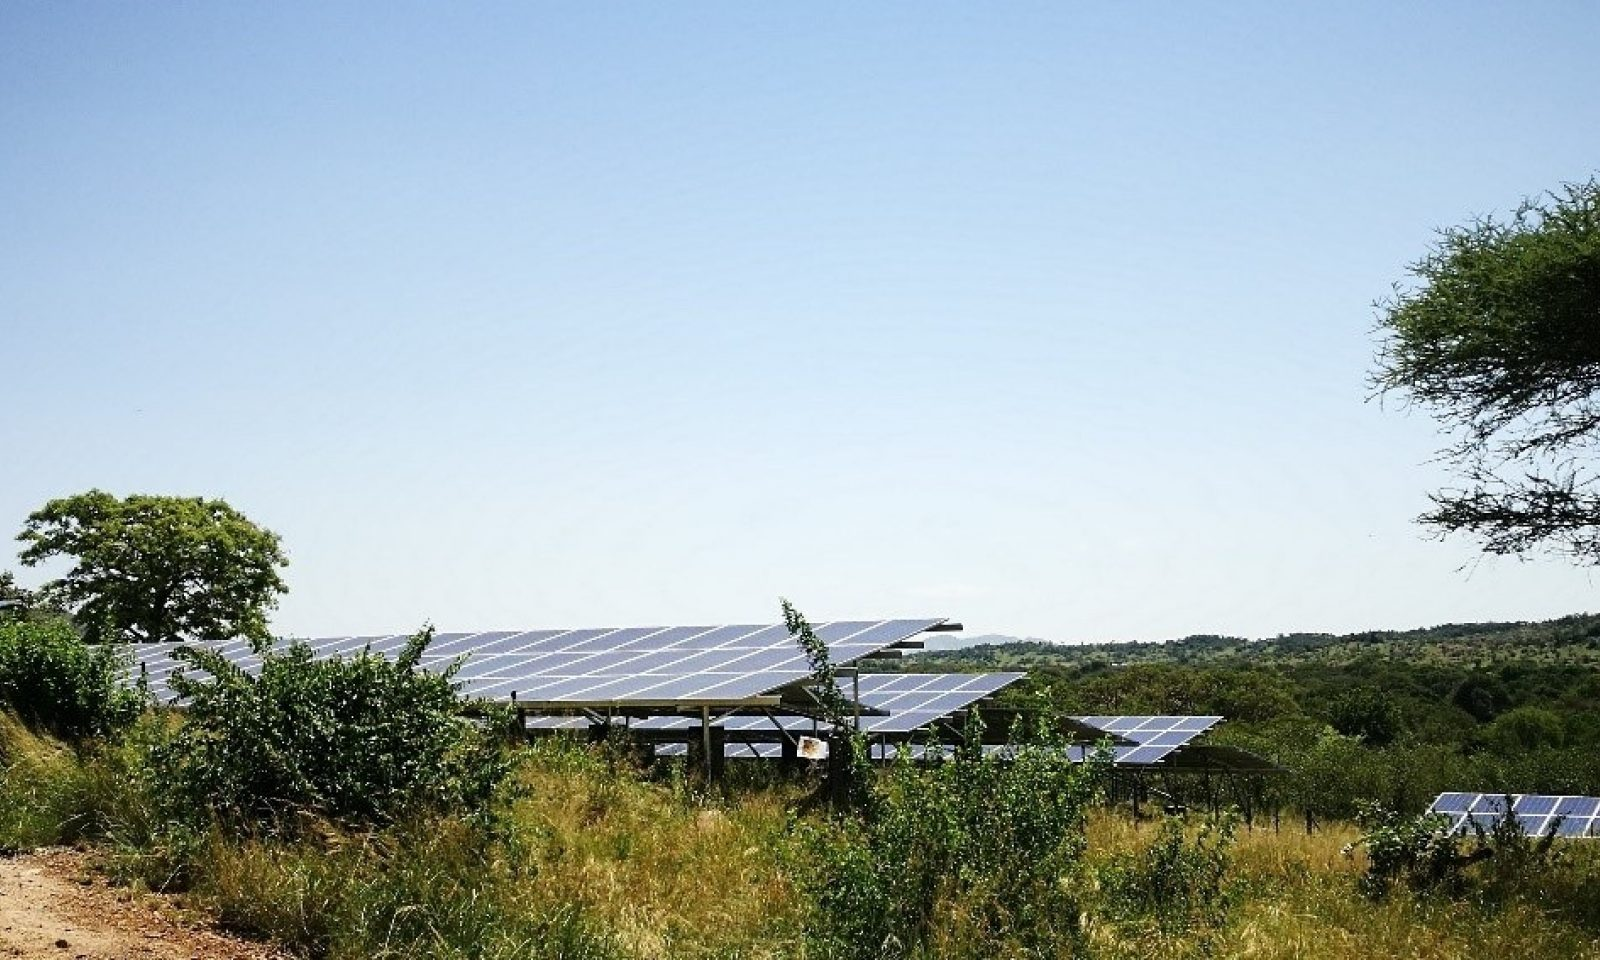 Faru Faru Photovoltaic Panels